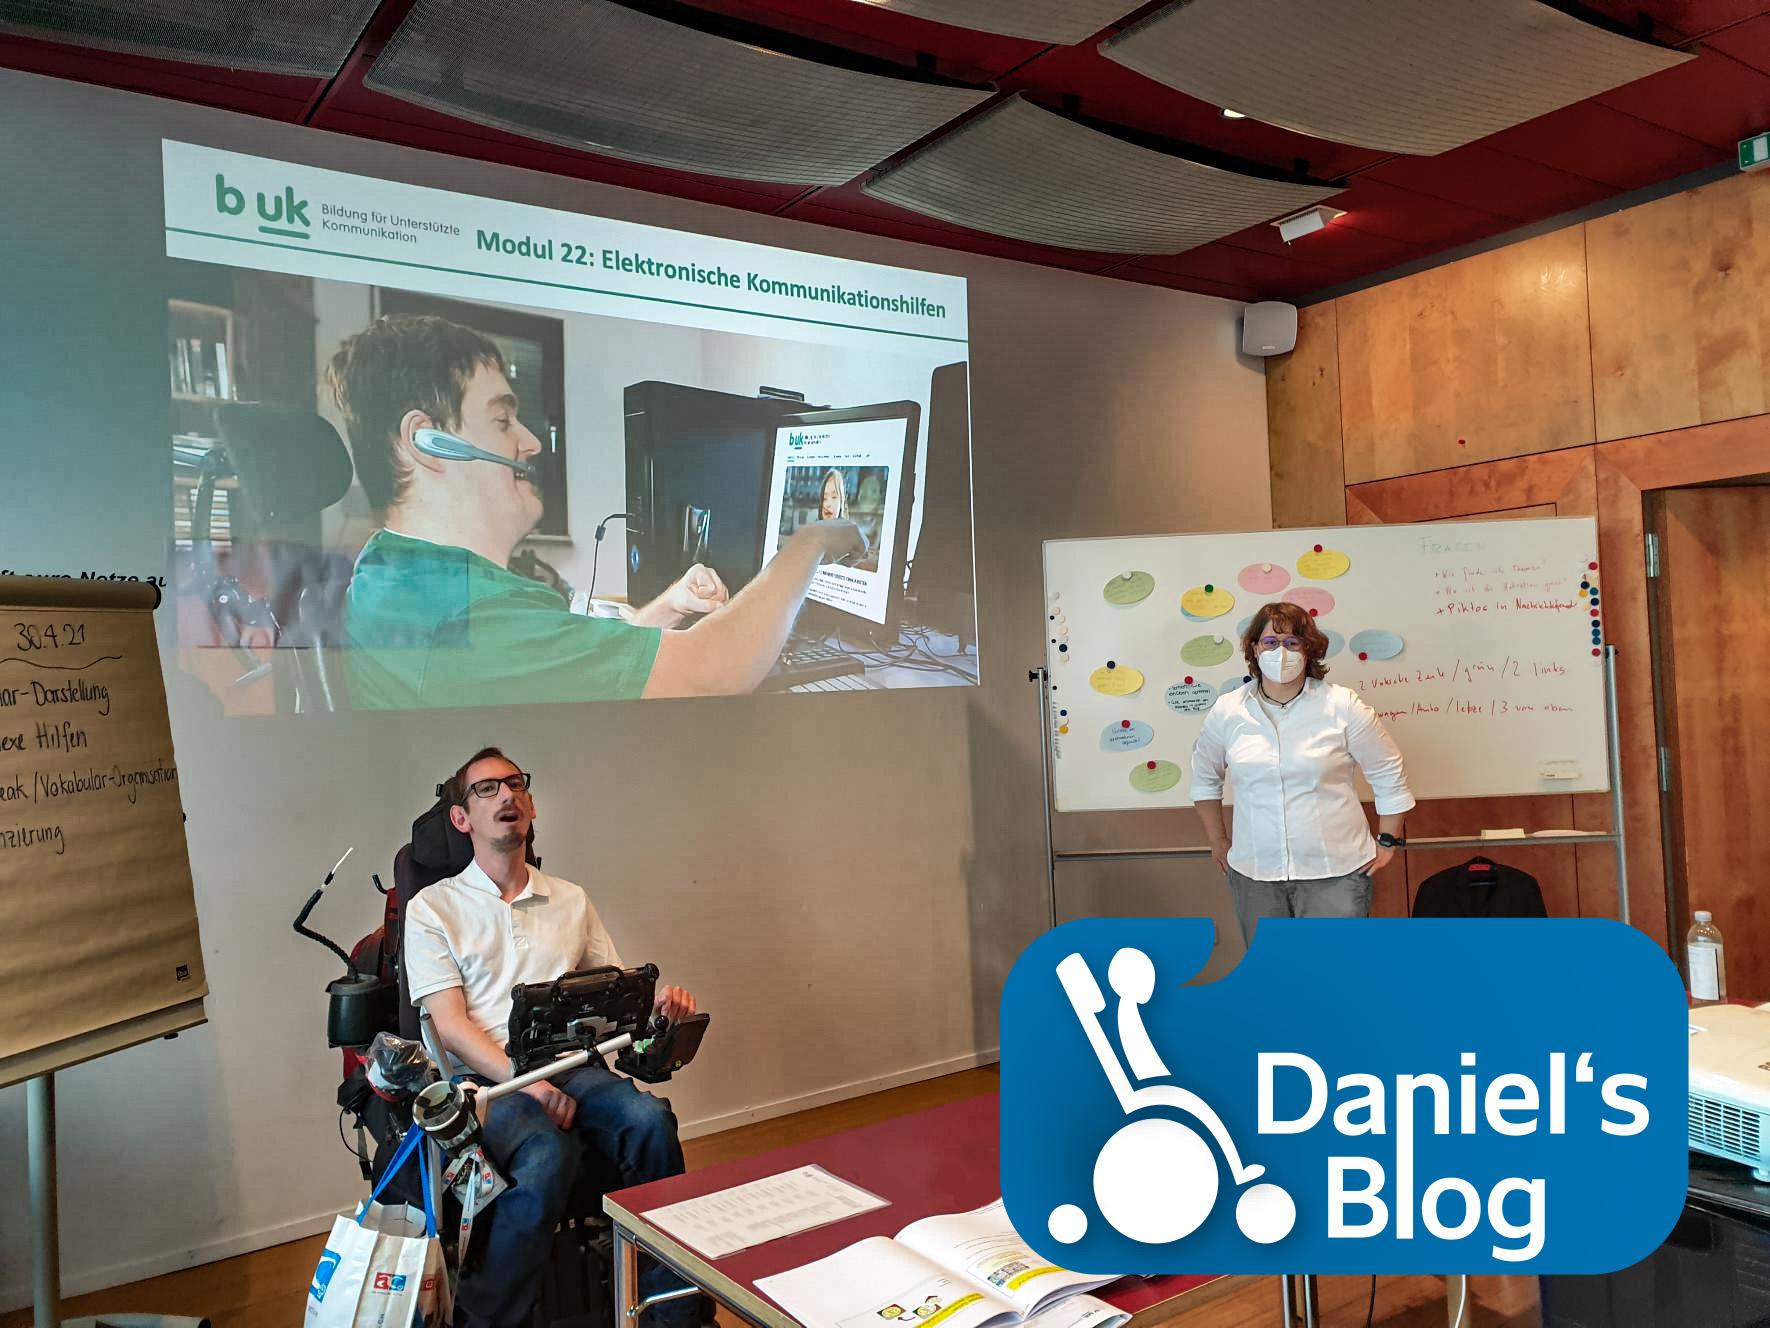 Oktober-Blog Daniel